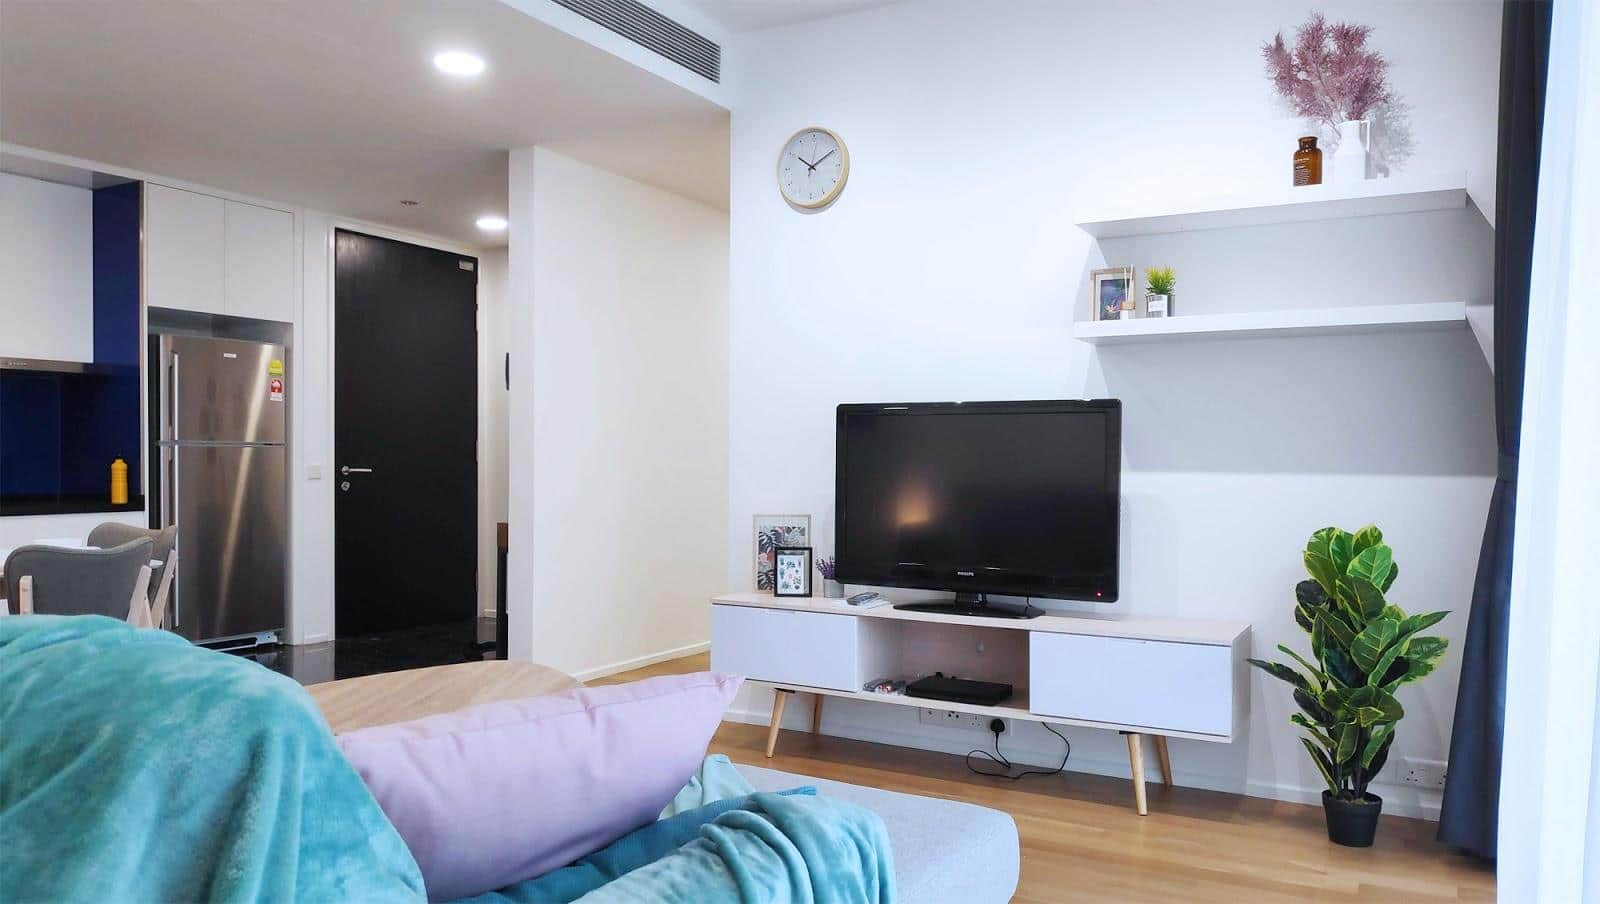 Konsol TV di ruang tamu, dengan dua rak putih terpasang di sudut kanan atas